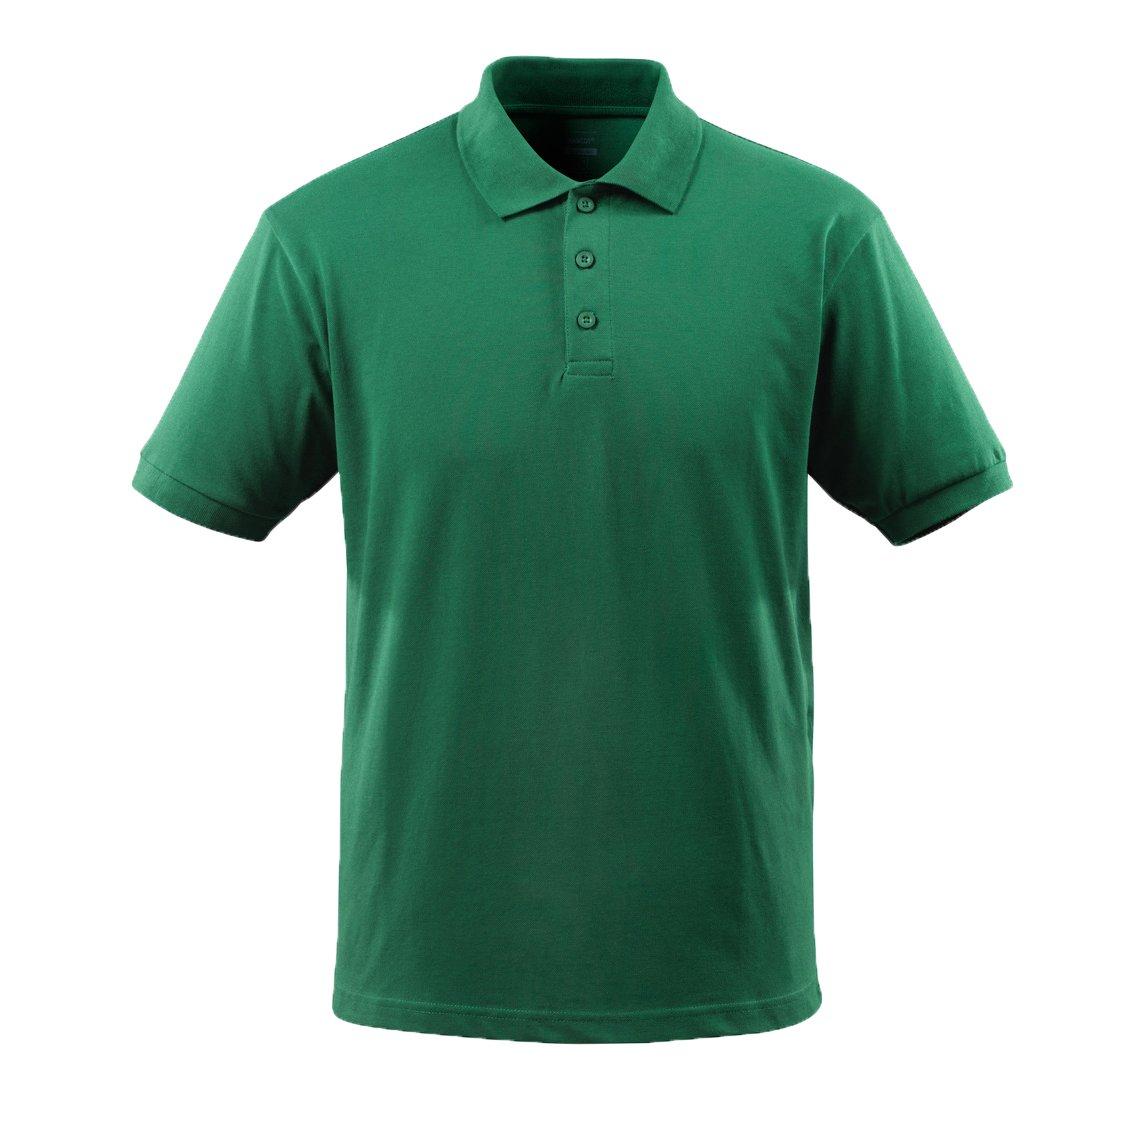 Mascot 51587-969-03-4XL Polo-ShirtBandol Size 4XL Green